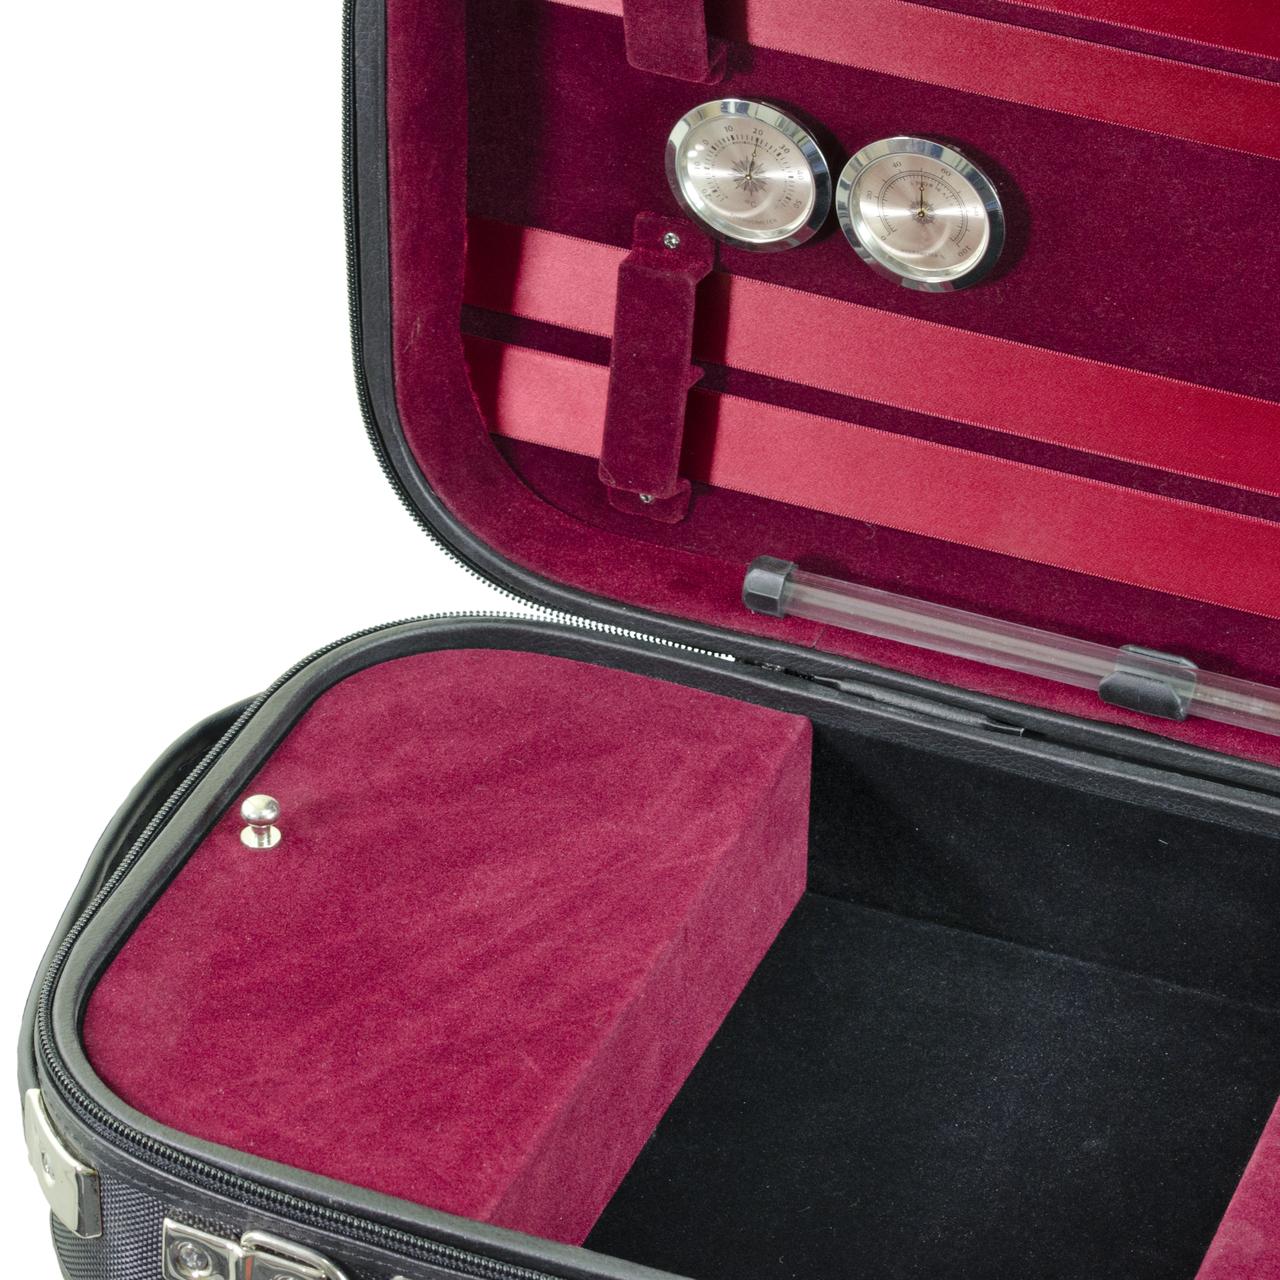 Portland Advanced Violin Case in action